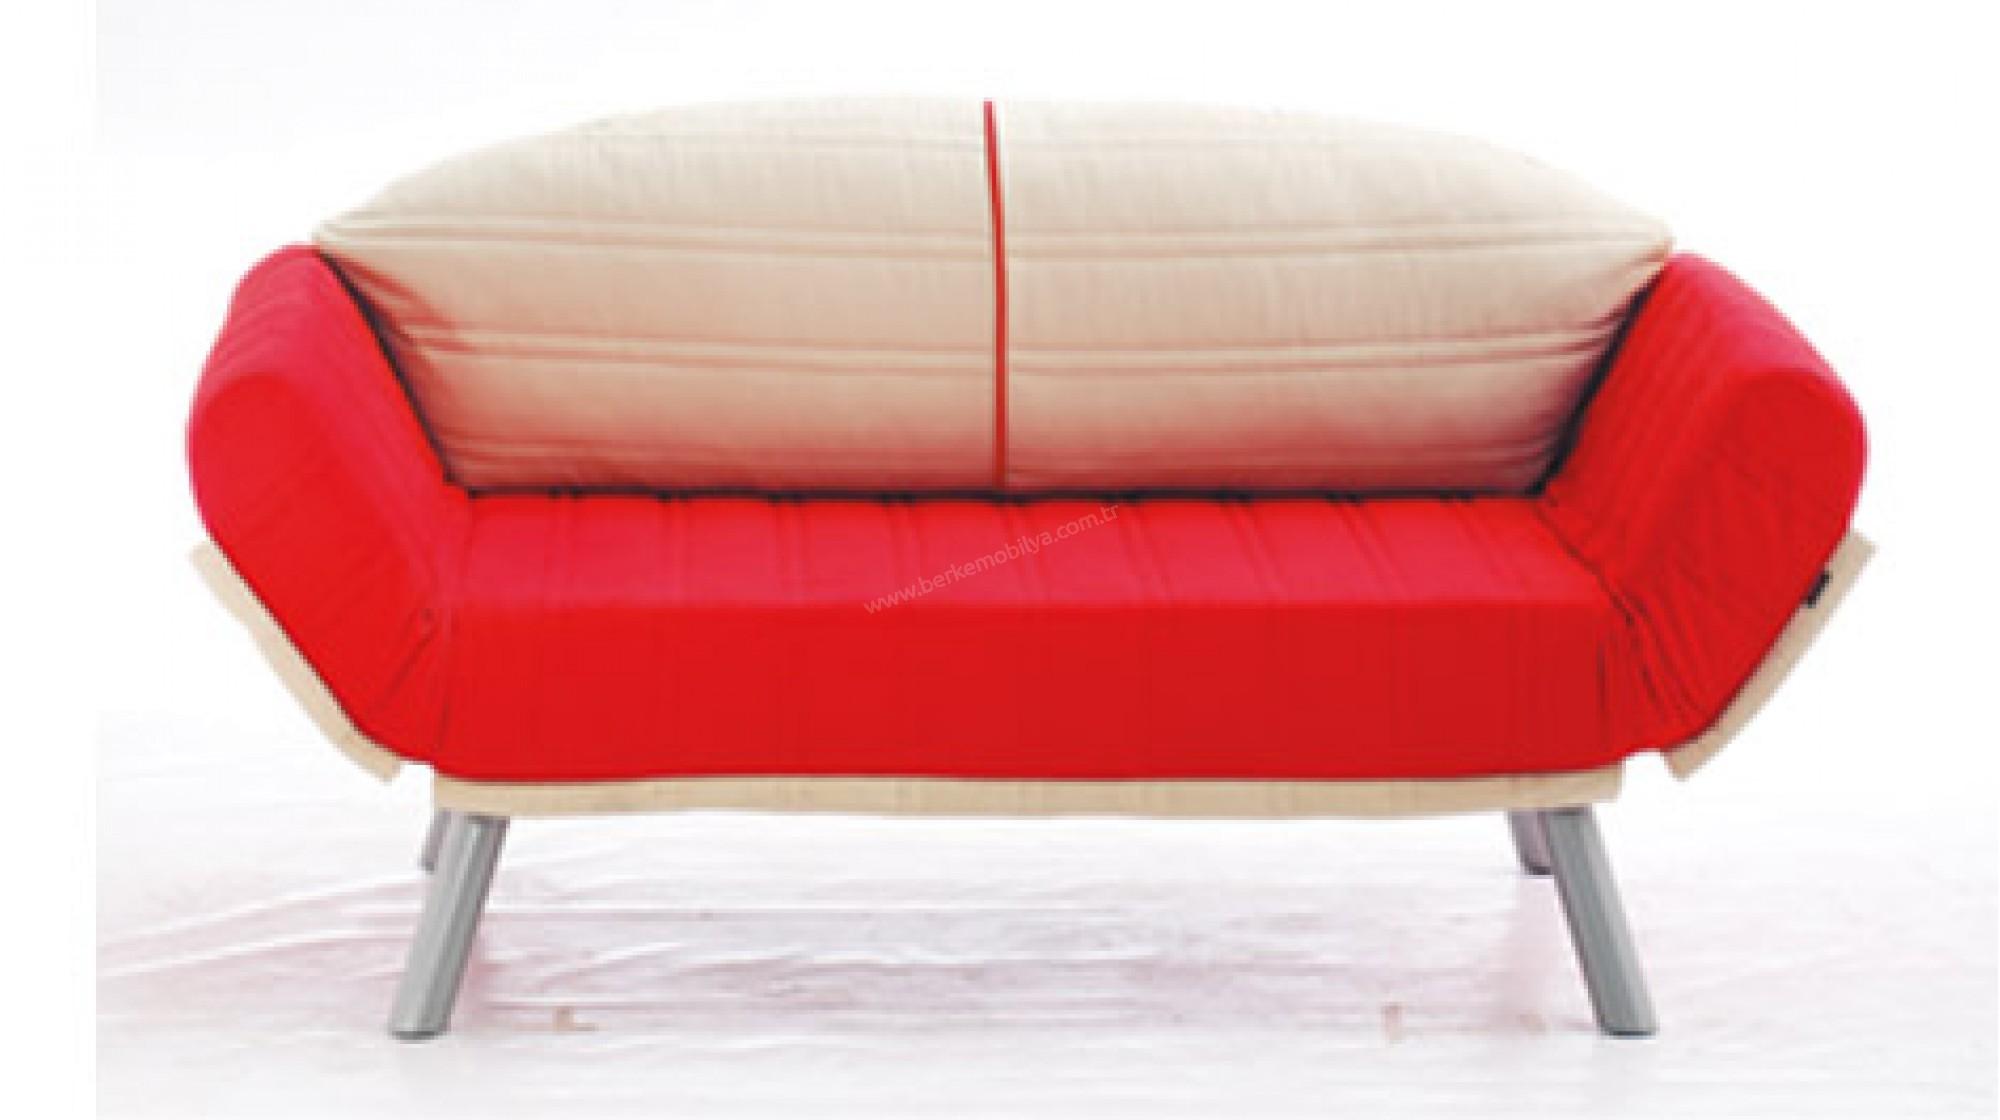 Mercan ikili kanepe modeli